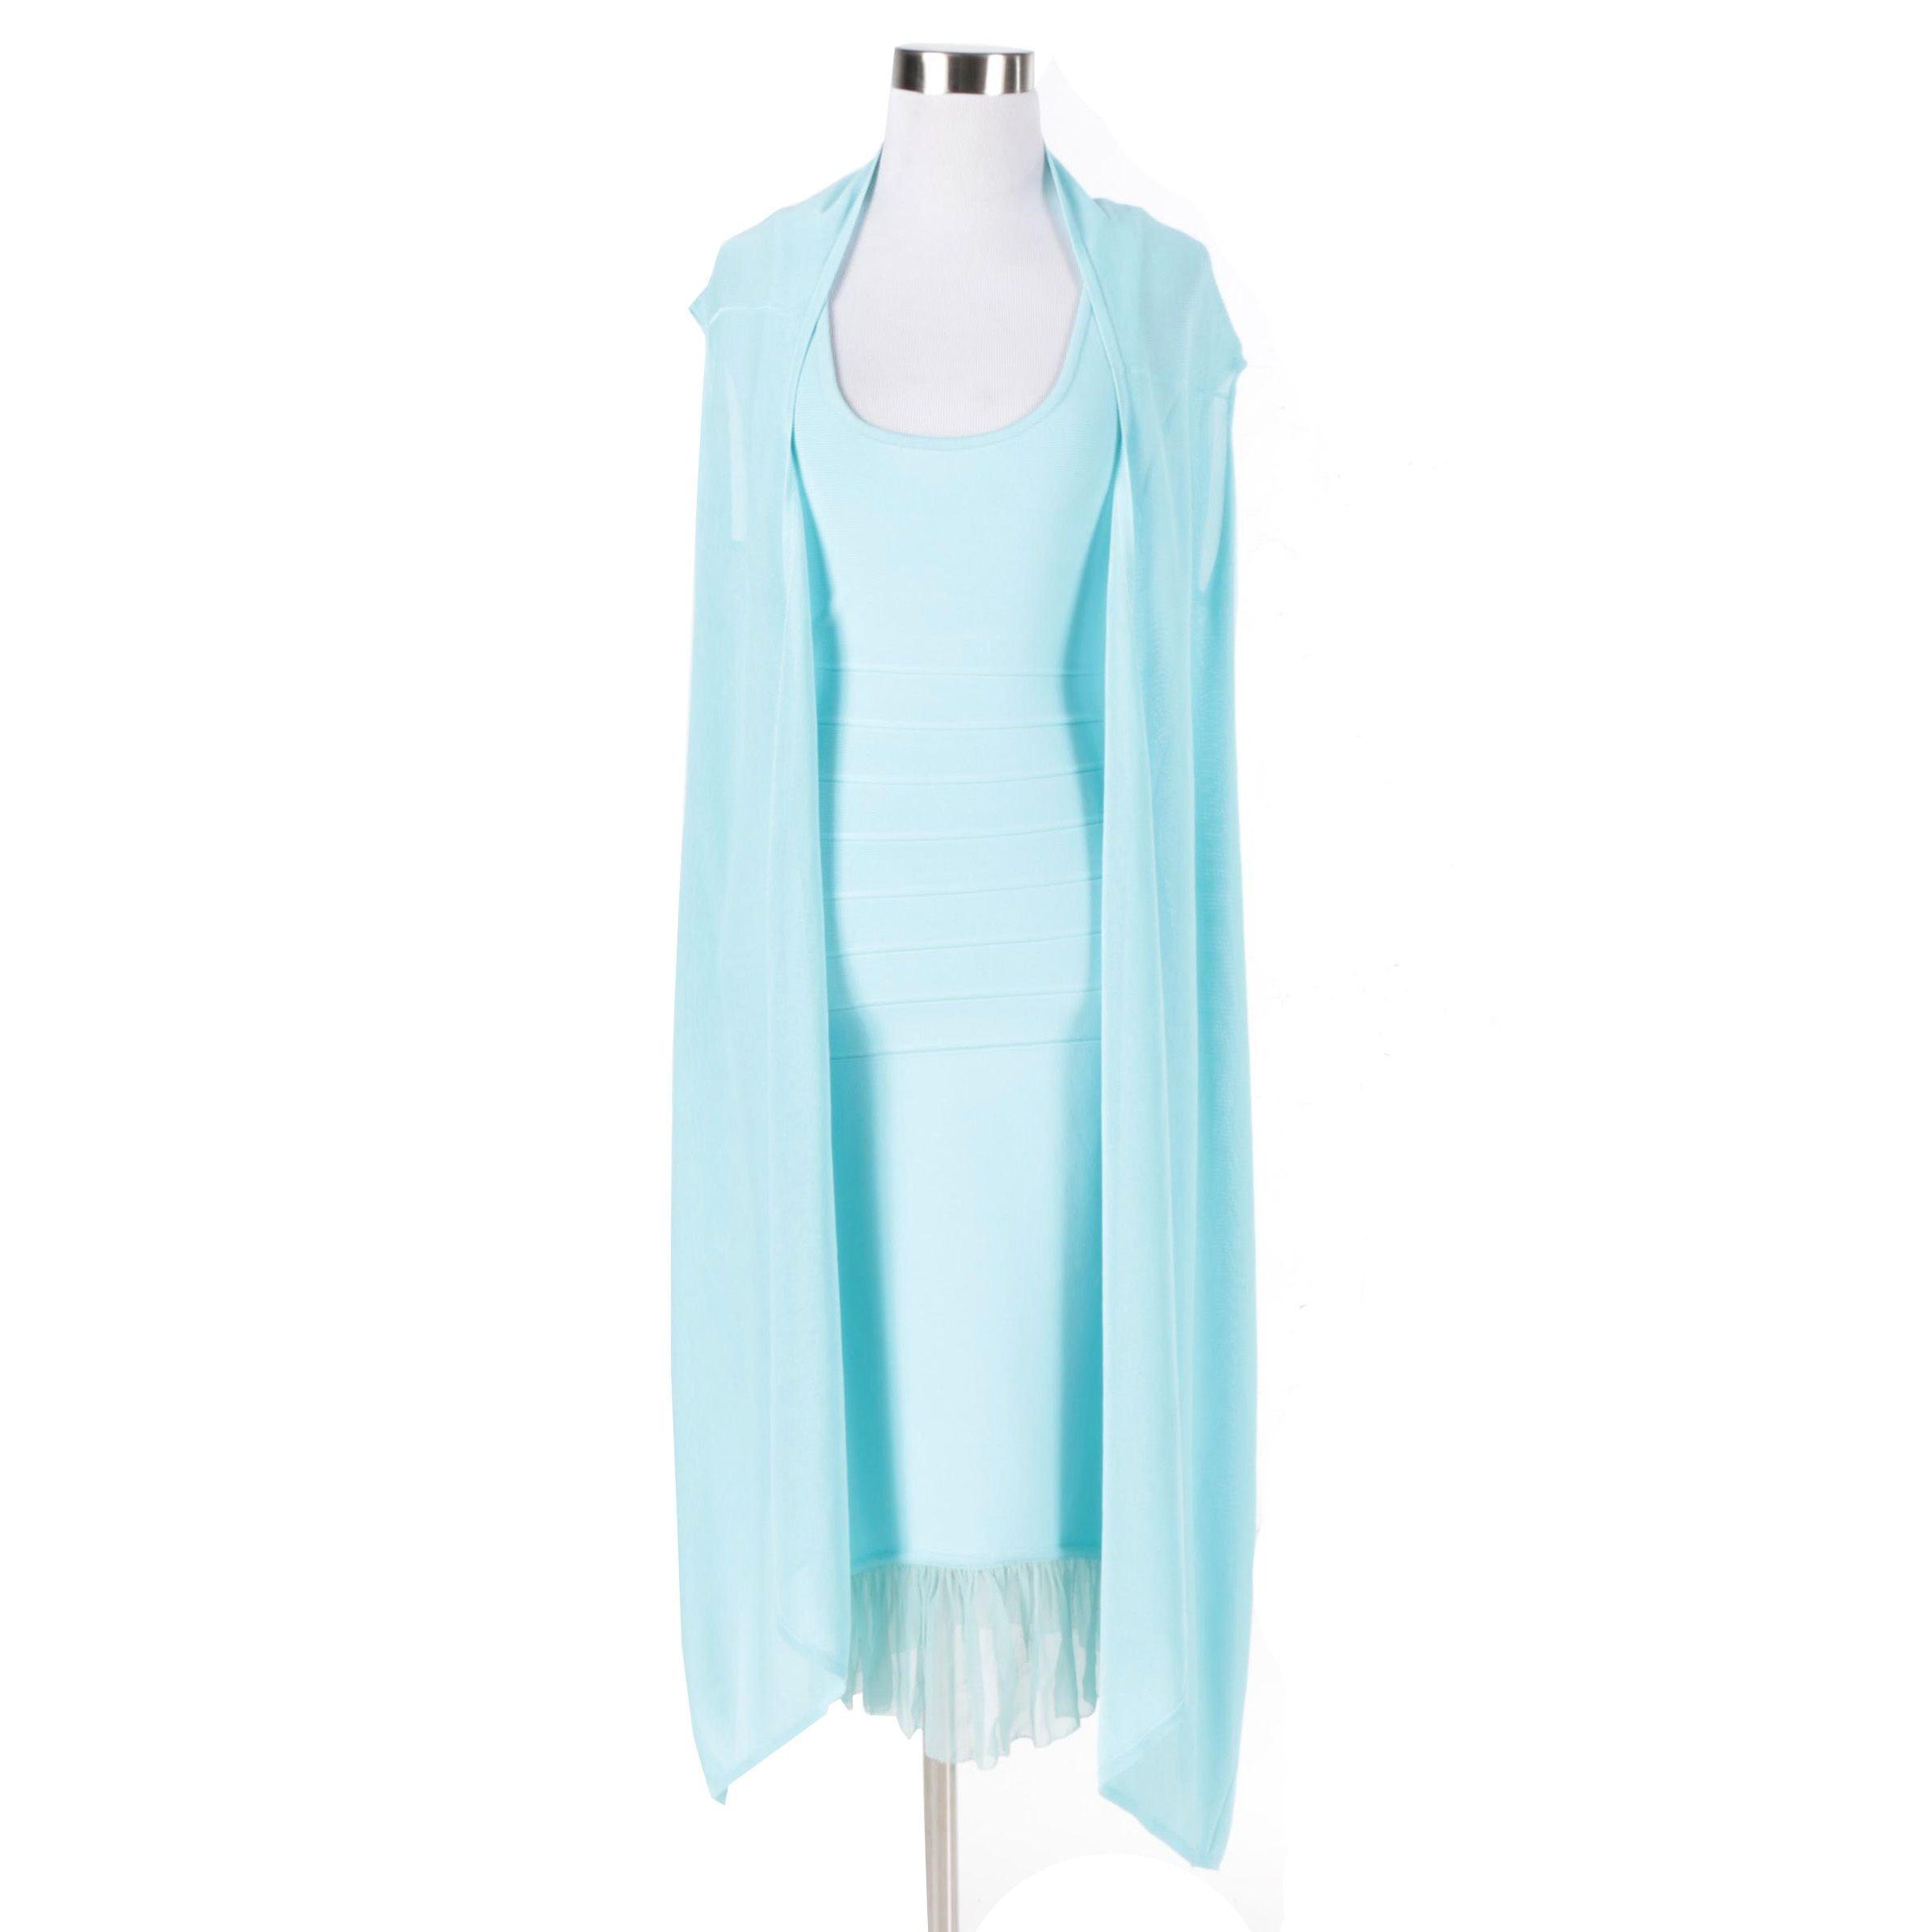 Herve Leger Paris Light Aqua Blue Knit Dress Set